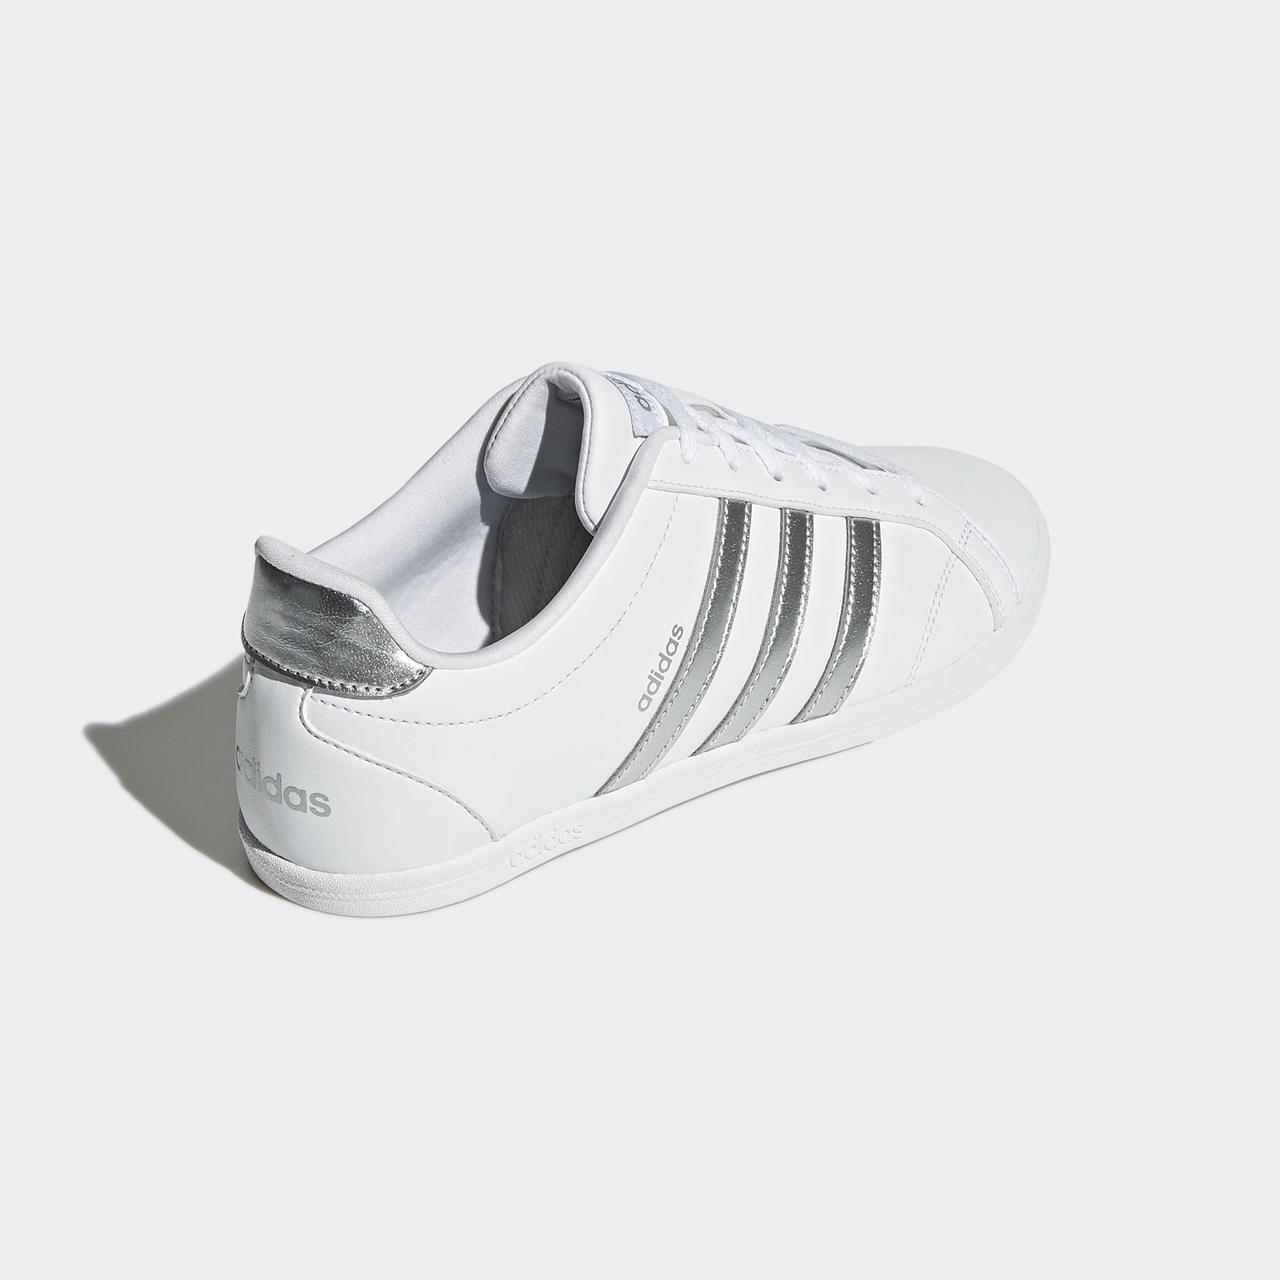 28aa19ae Купить Женские кроссовки Adidas Neo Vs Coneo QT (Артикул: DB0135) в ...